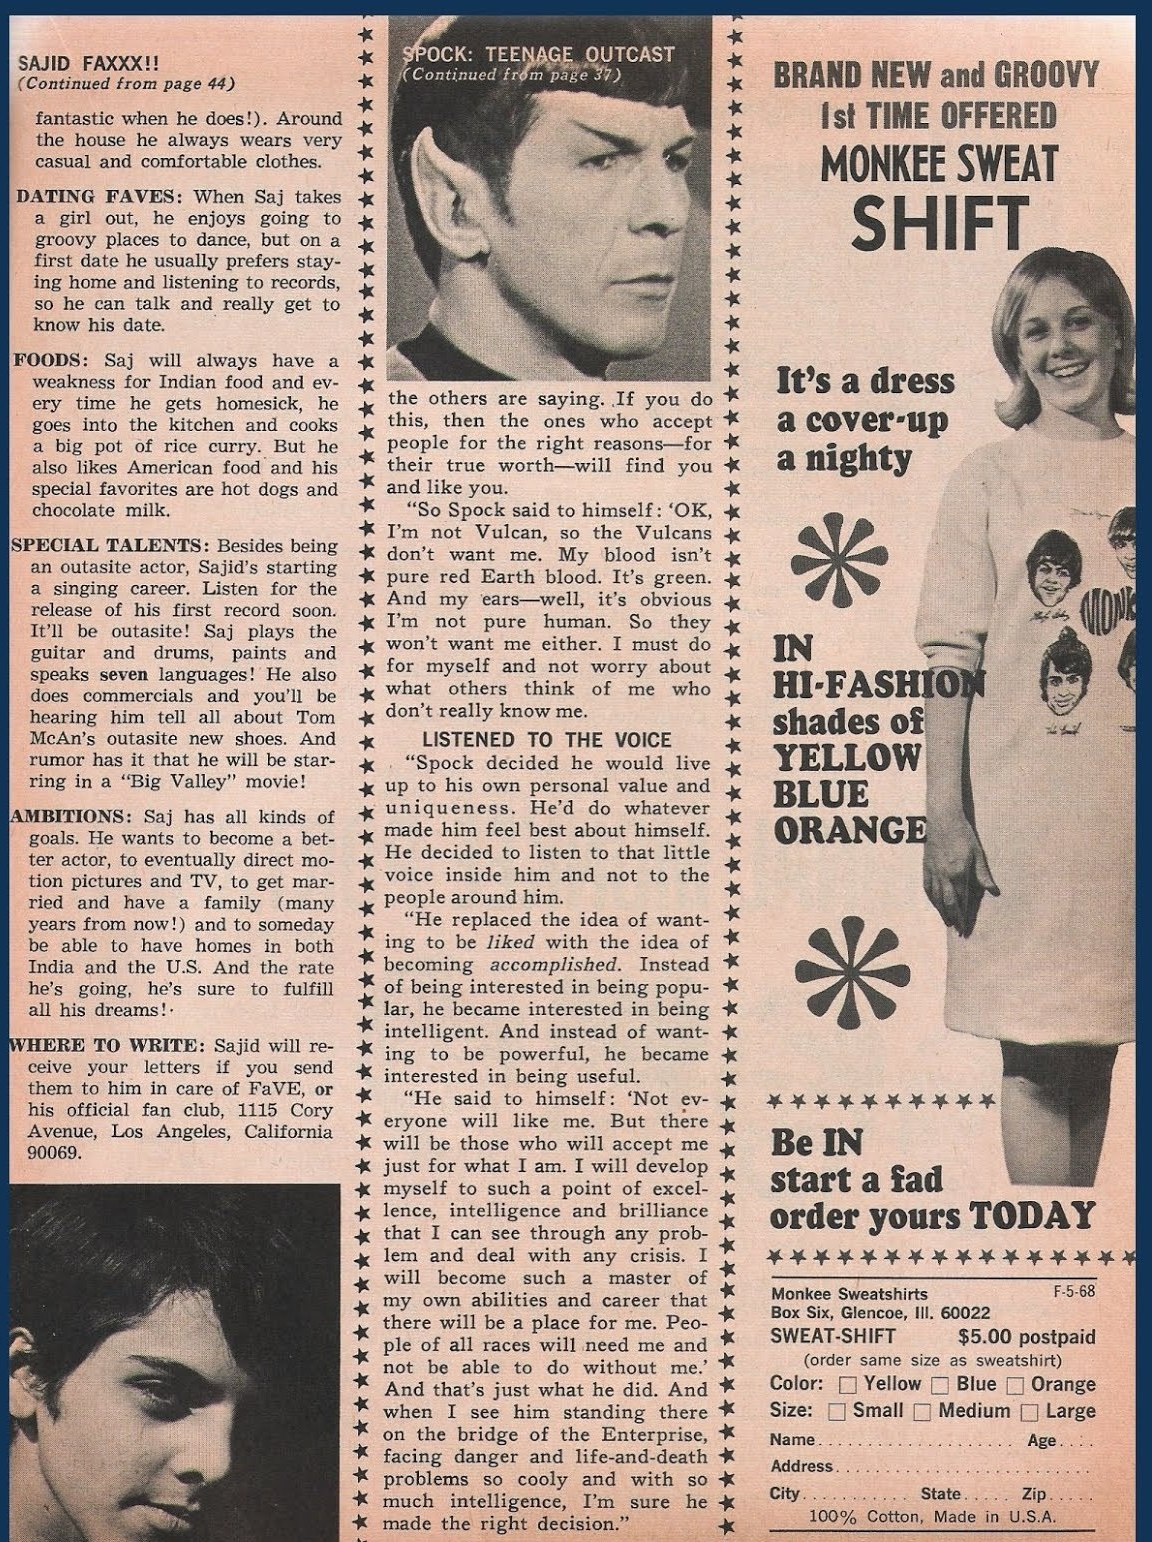 Leonard Nimoy's Advice To A Biracial Girl In 1968